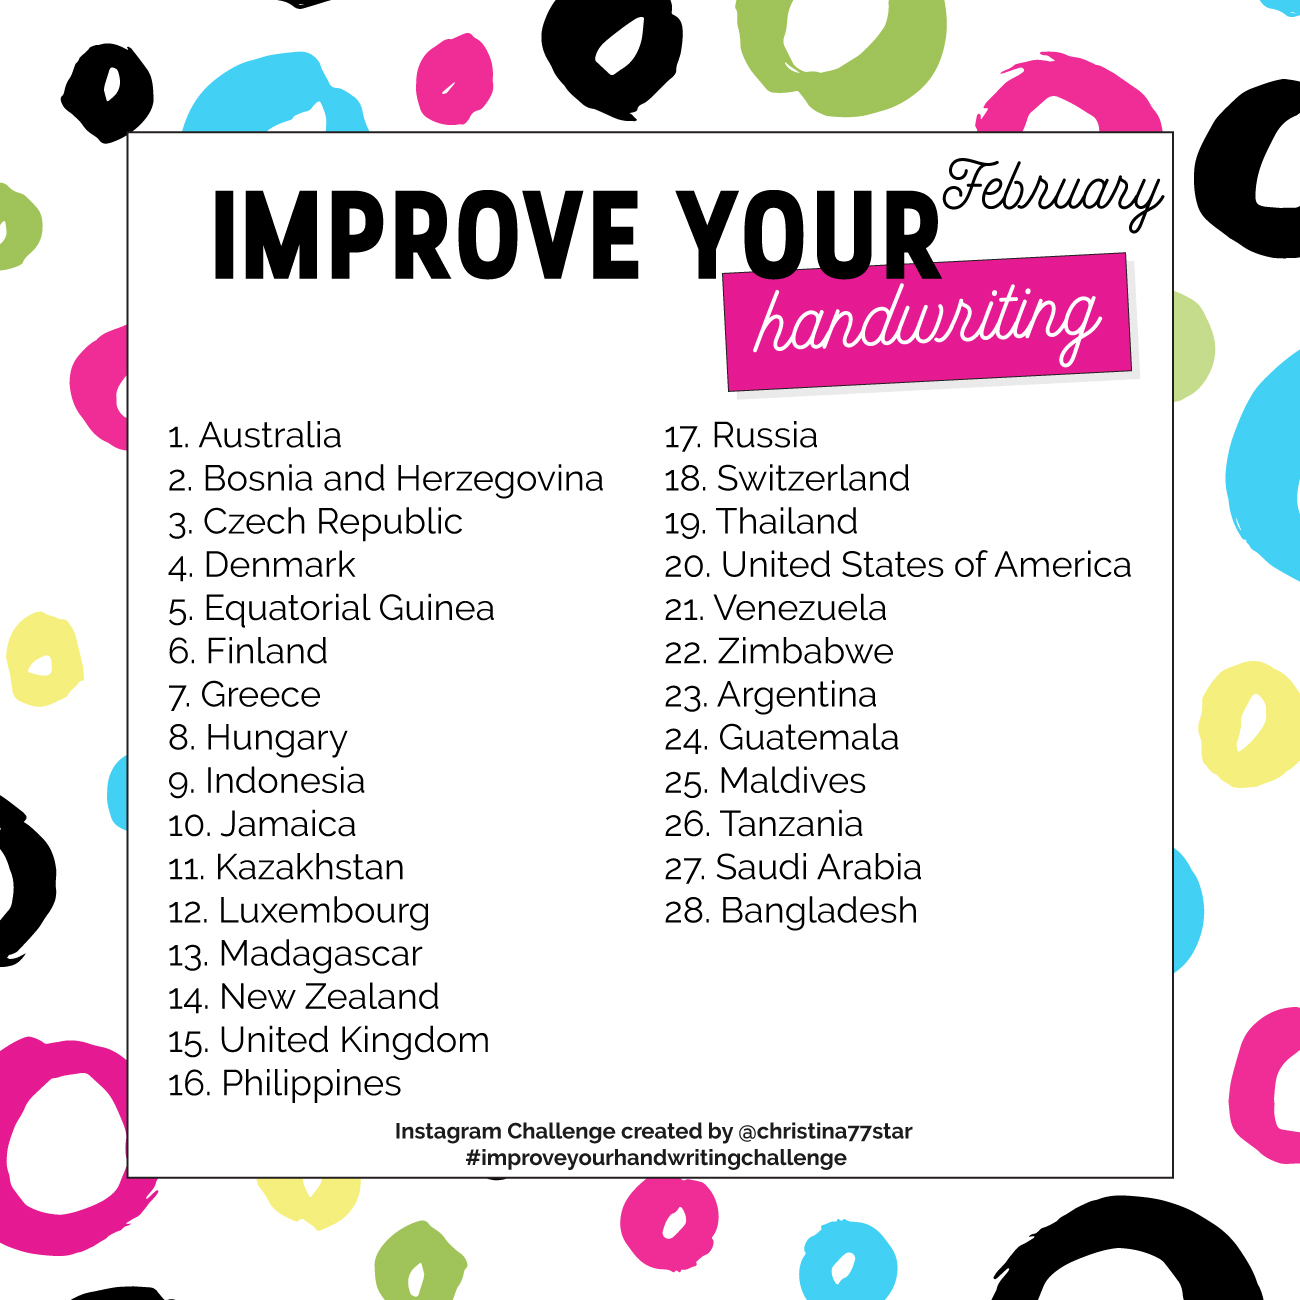 Improve Your Handwriting Challenge - January 2019 | christina77star